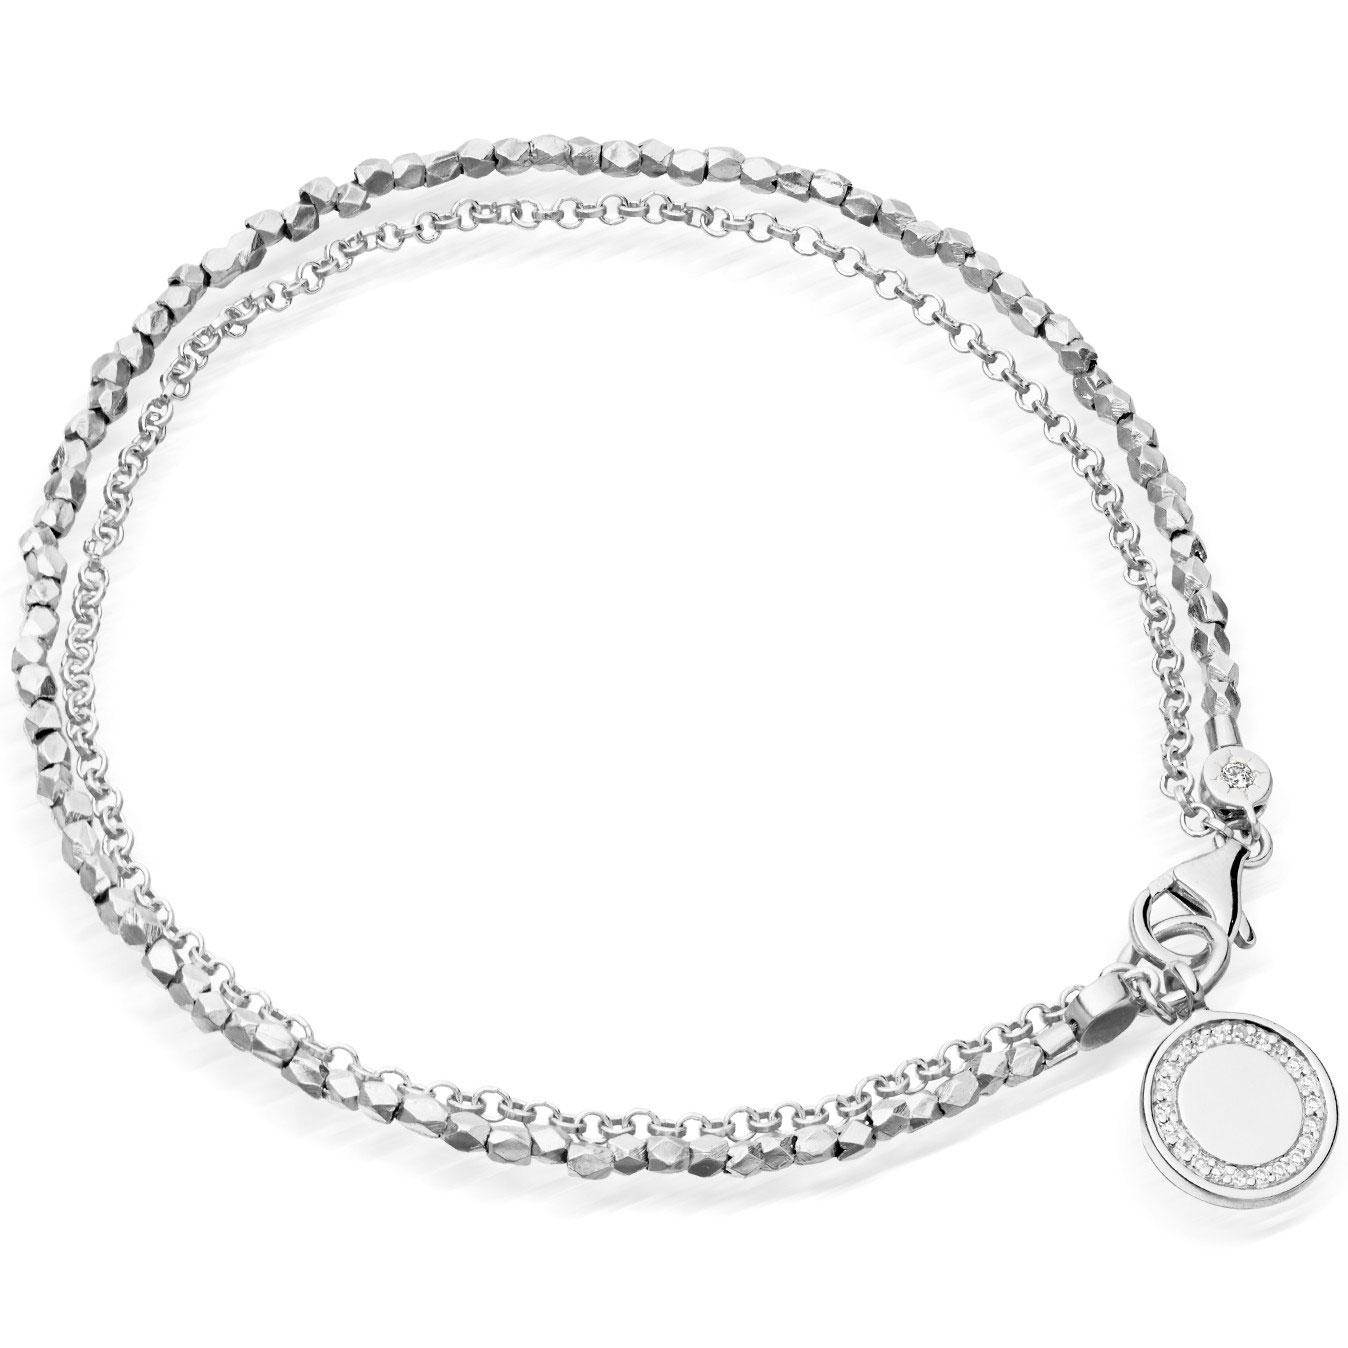 Cosmos Biography Bracelet